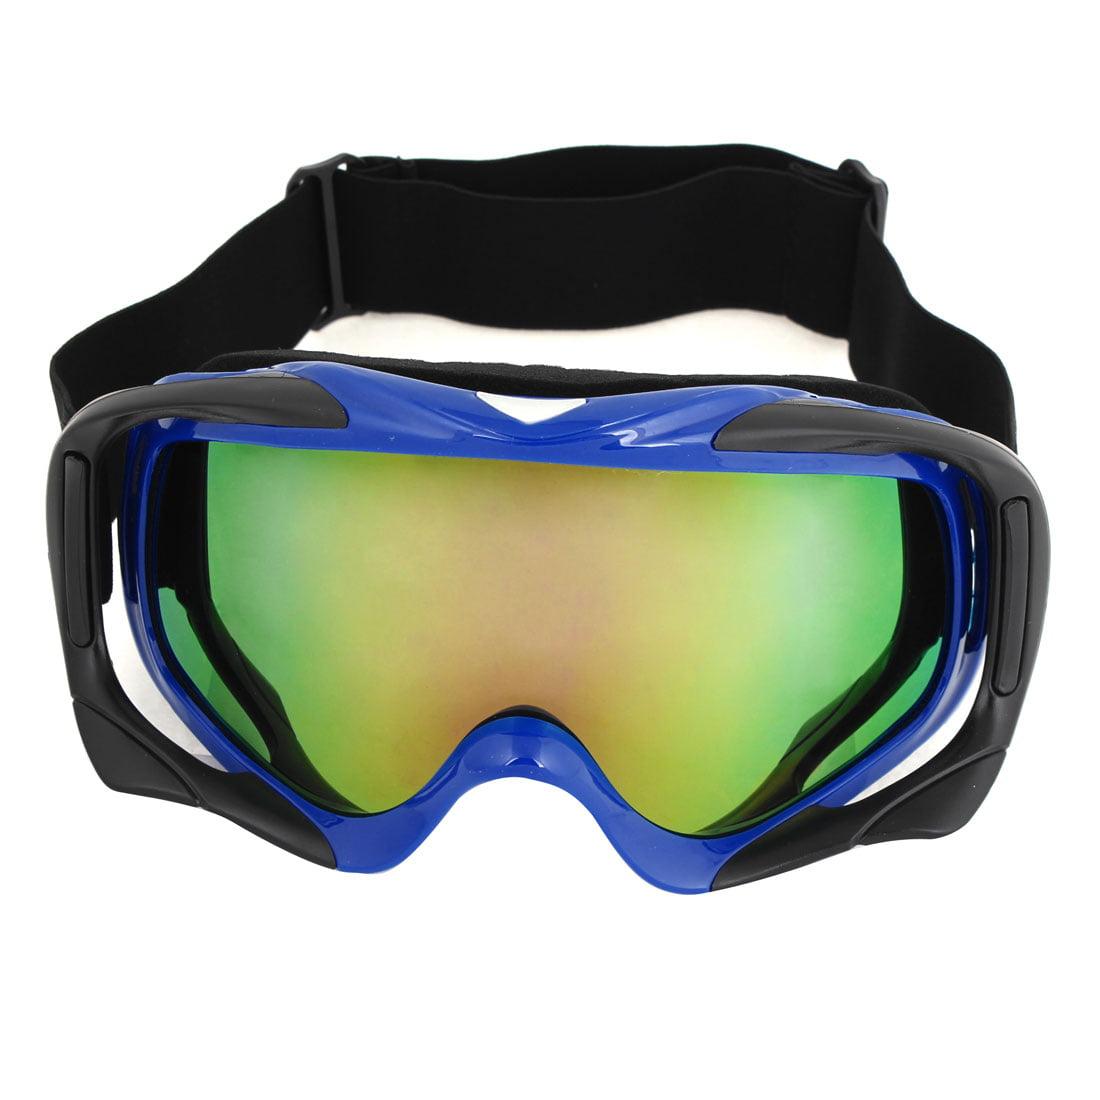 Unisex Off-road Hiking Colored Plastic Lens Foldable Ski Skate Goggles Blue Rim by Unique-Bargains